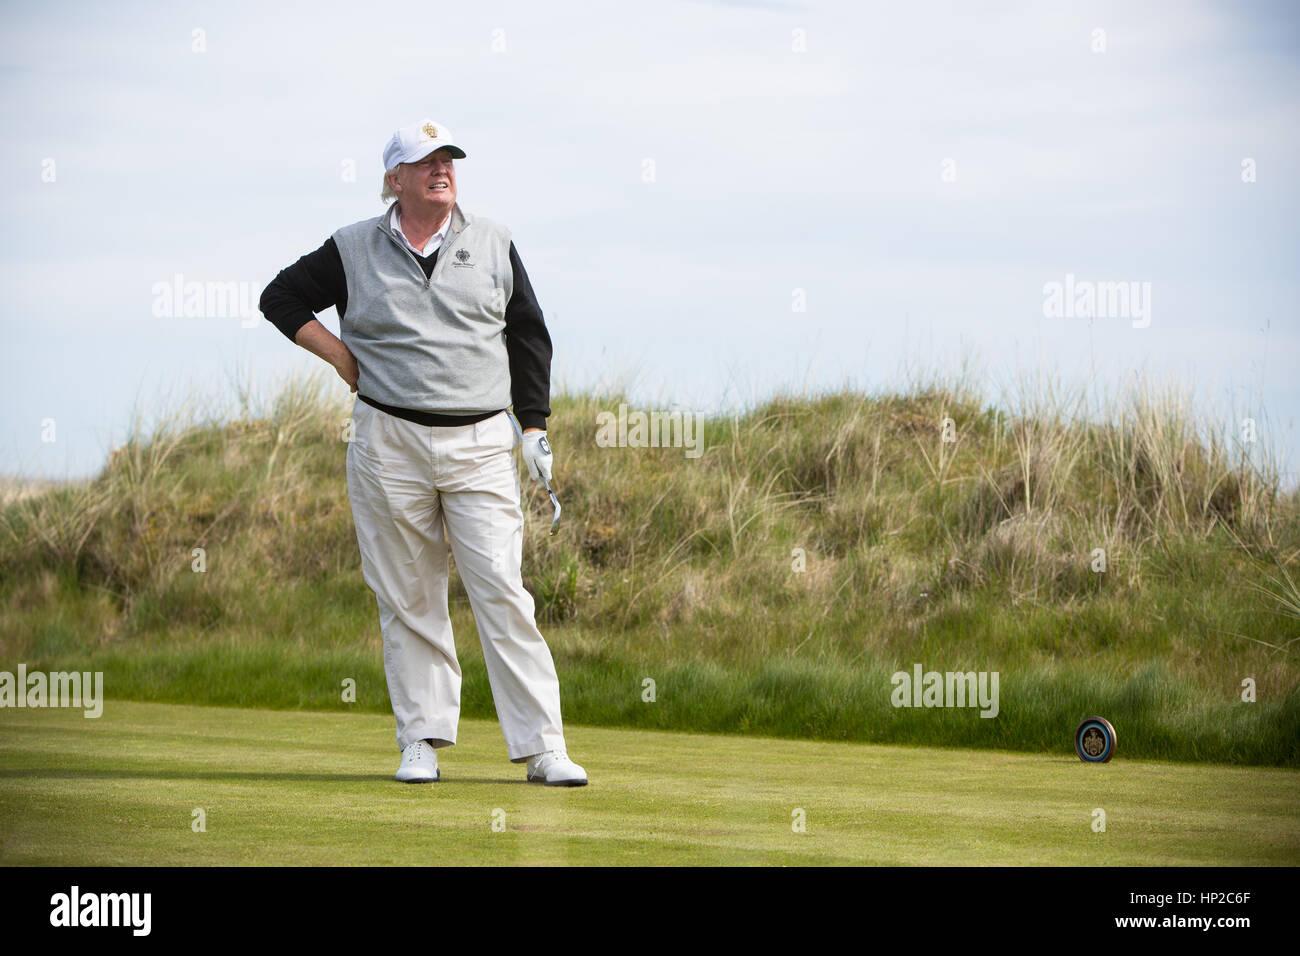 President Donald Trump Photographed at Trump Links International Golf Course at Aberdeen Scotland. - Stock Image